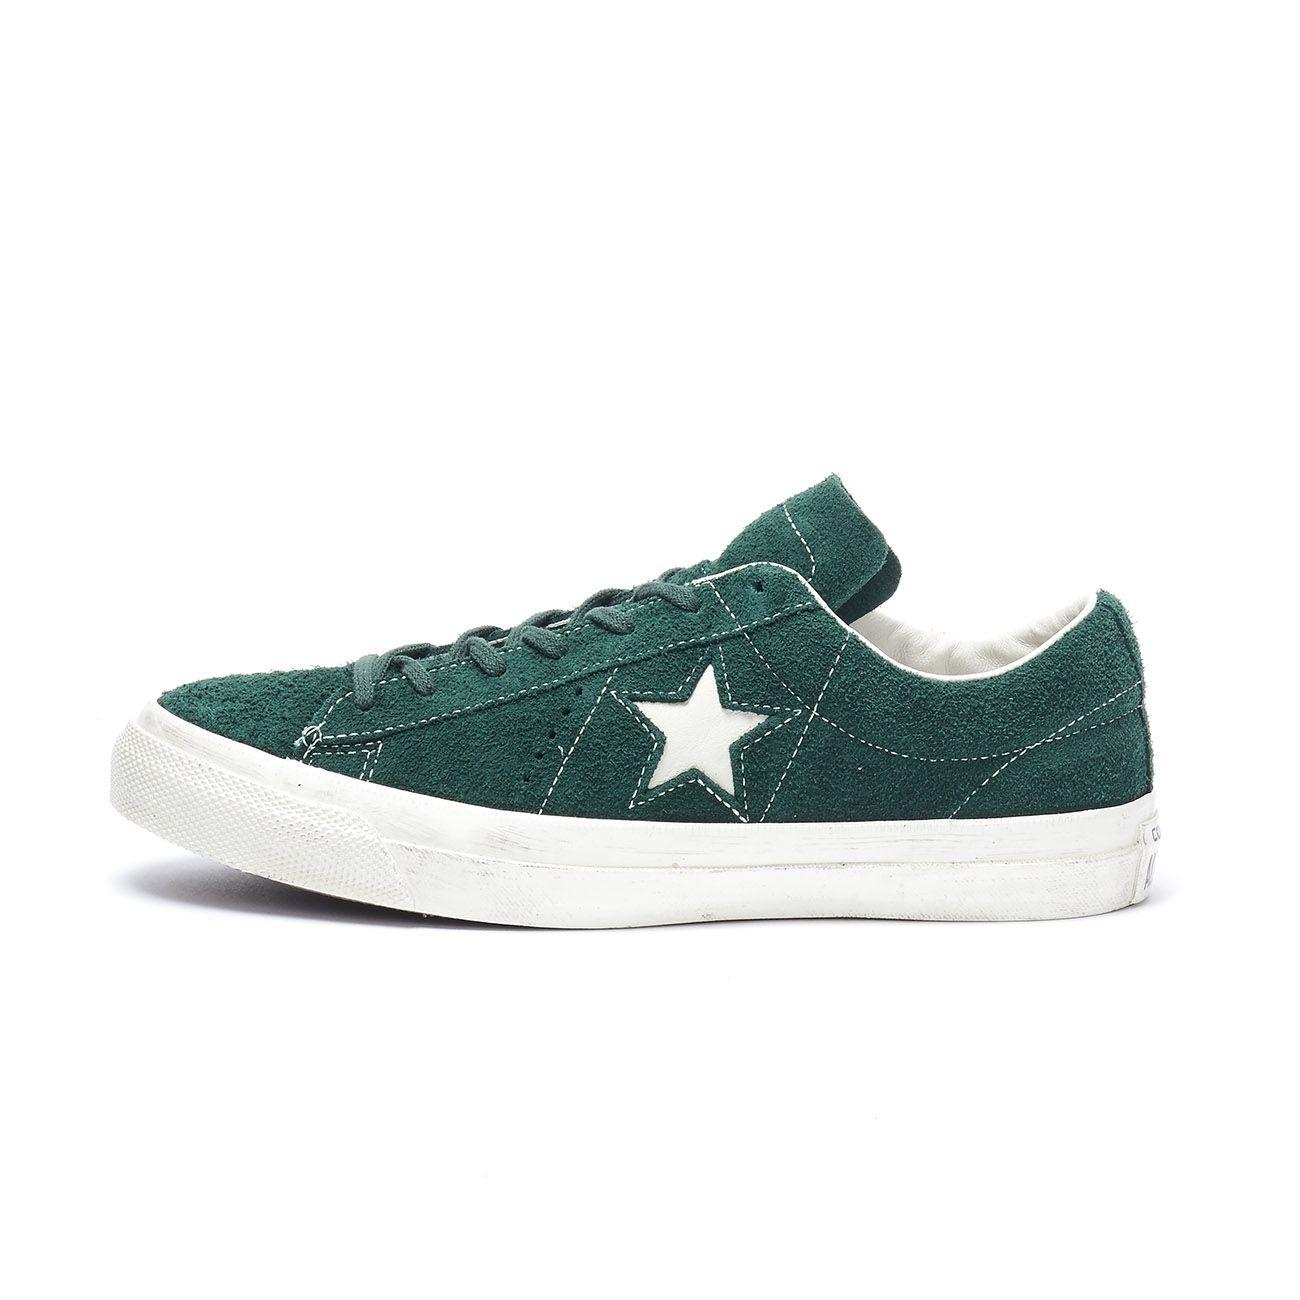 CONVERSE SNEAKERS ONE STAR OX Uomo Verde panna | Mascheroni Sportswear